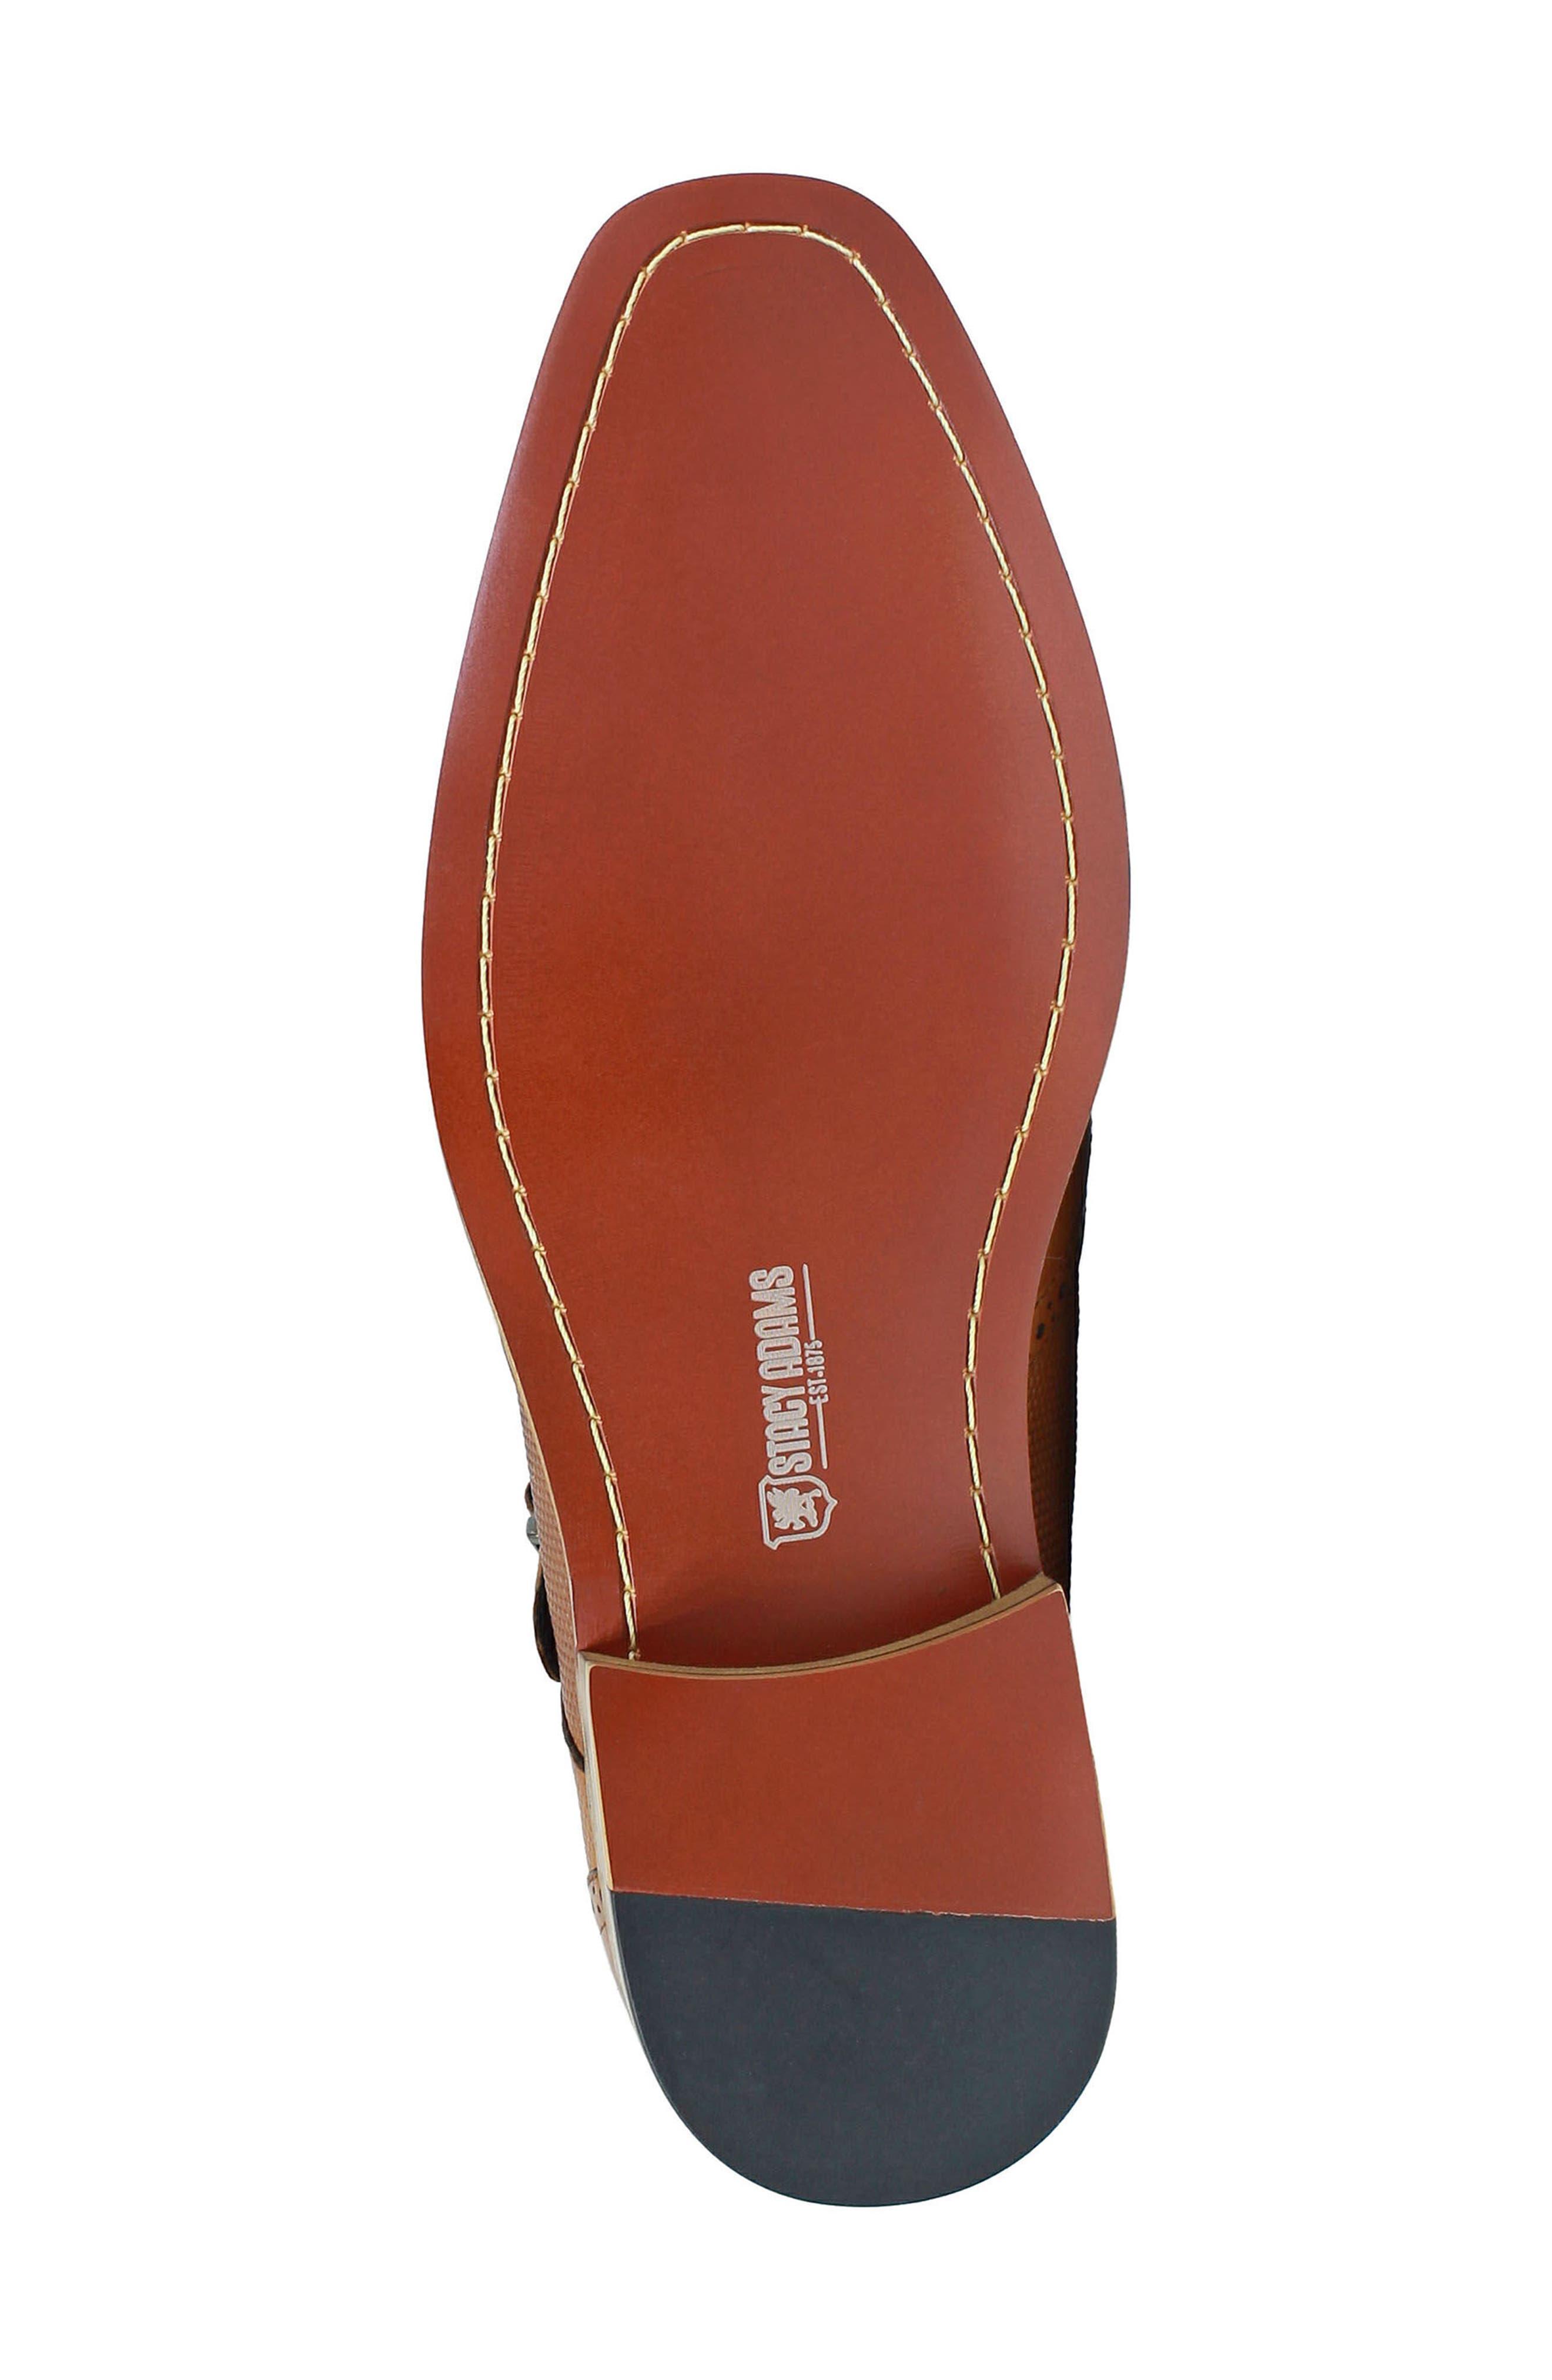 Lavine Wingtip Monk Shoe,                             Alternate thumbnail 6, color,                             SADDLE TAN LEATHER